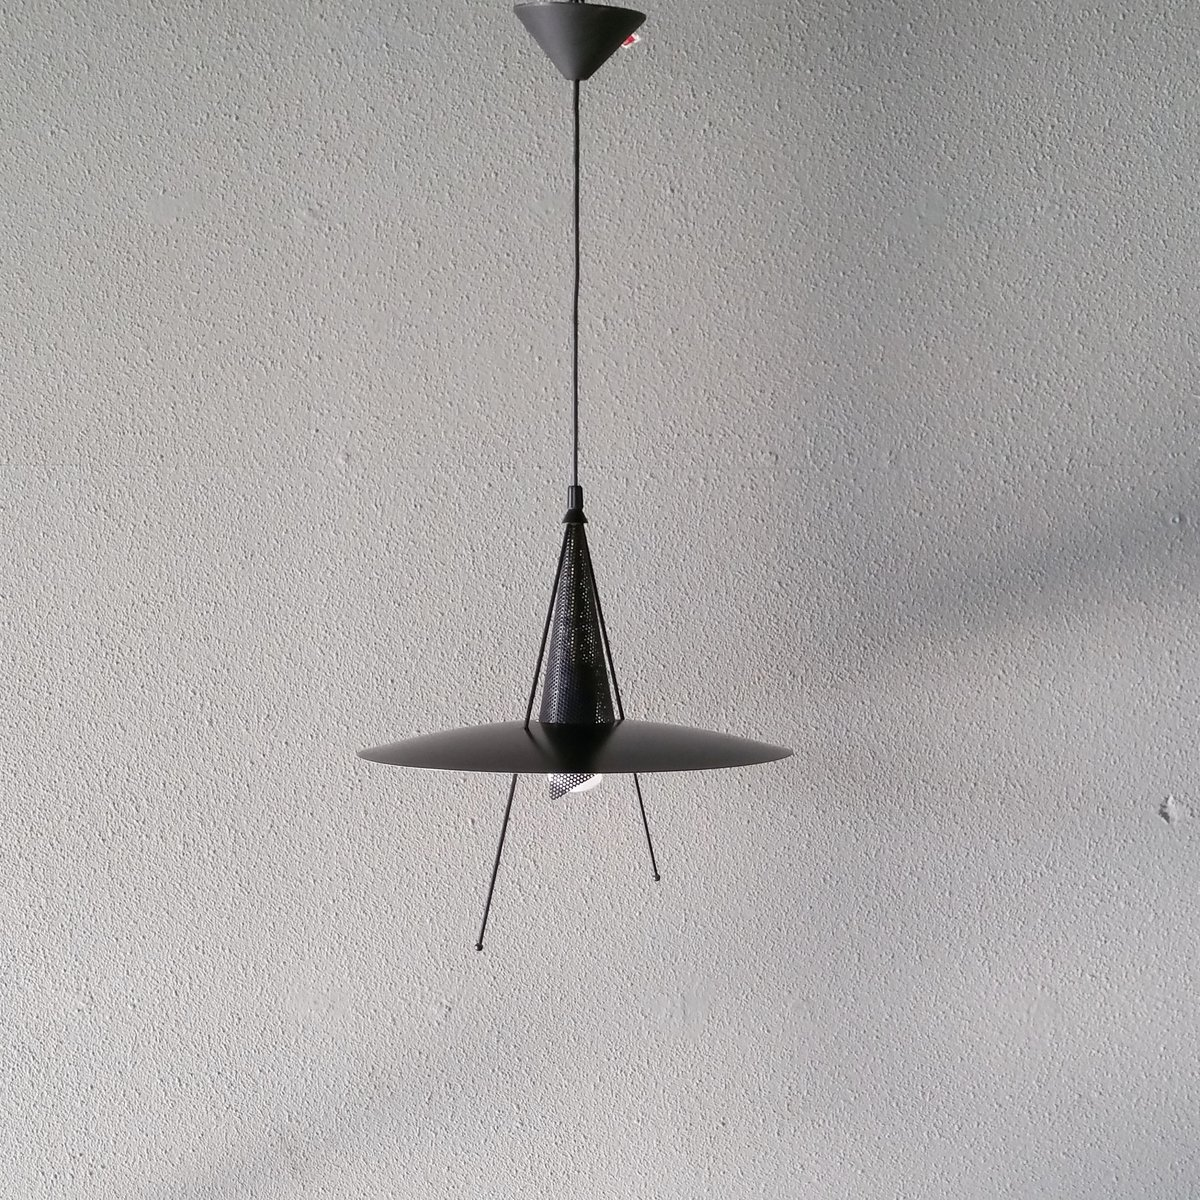 Memphis Hängelampe aus schwarzem Metall, 1980er